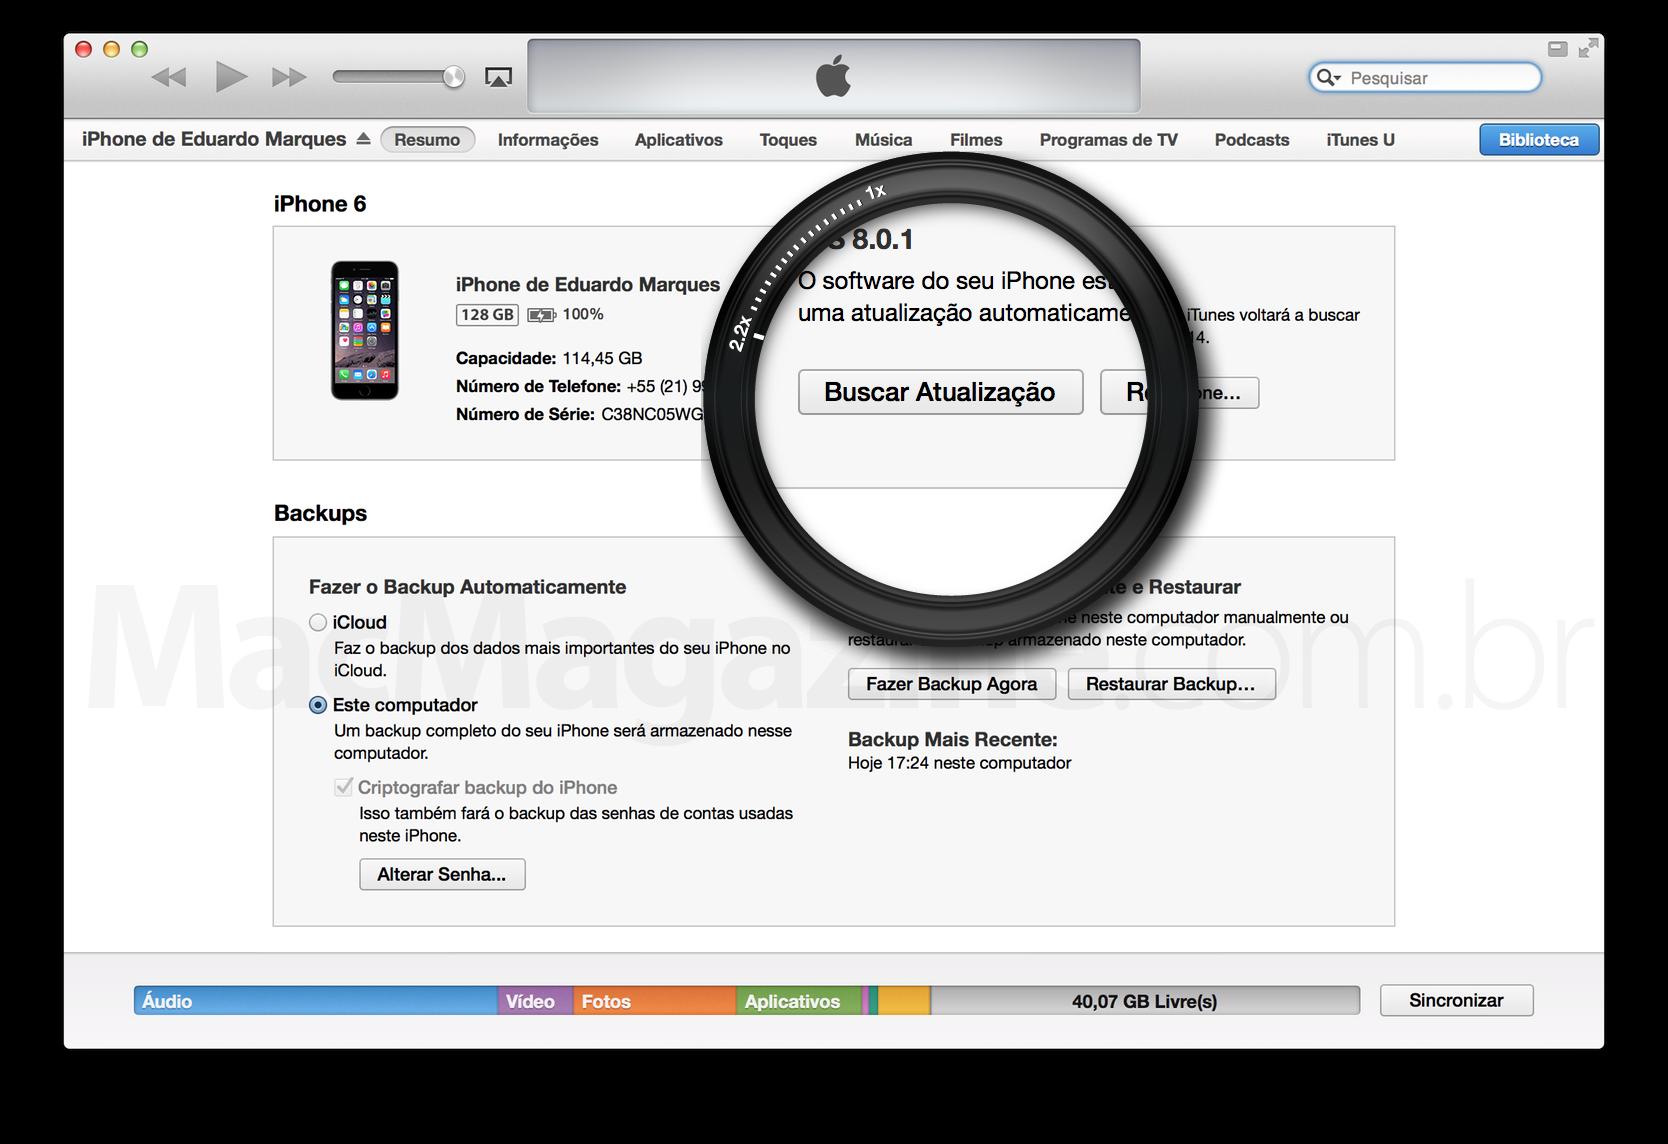 Instalando o iOS 8 manualmente no iTunes